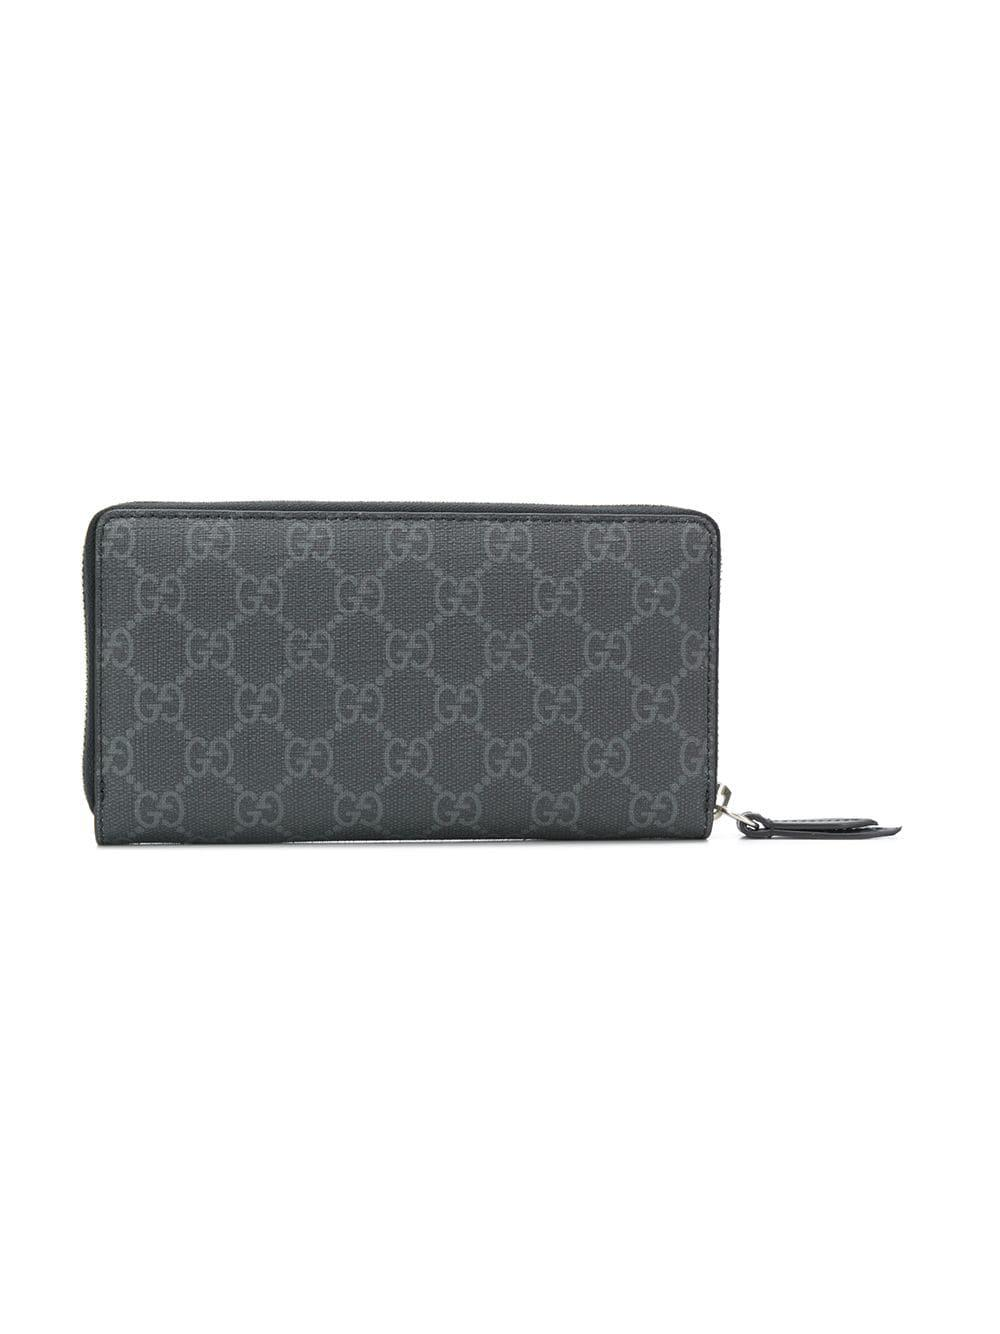 03cf8811d82 Gucci GG Supreme Owl Wallet in Black for Men - Lyst